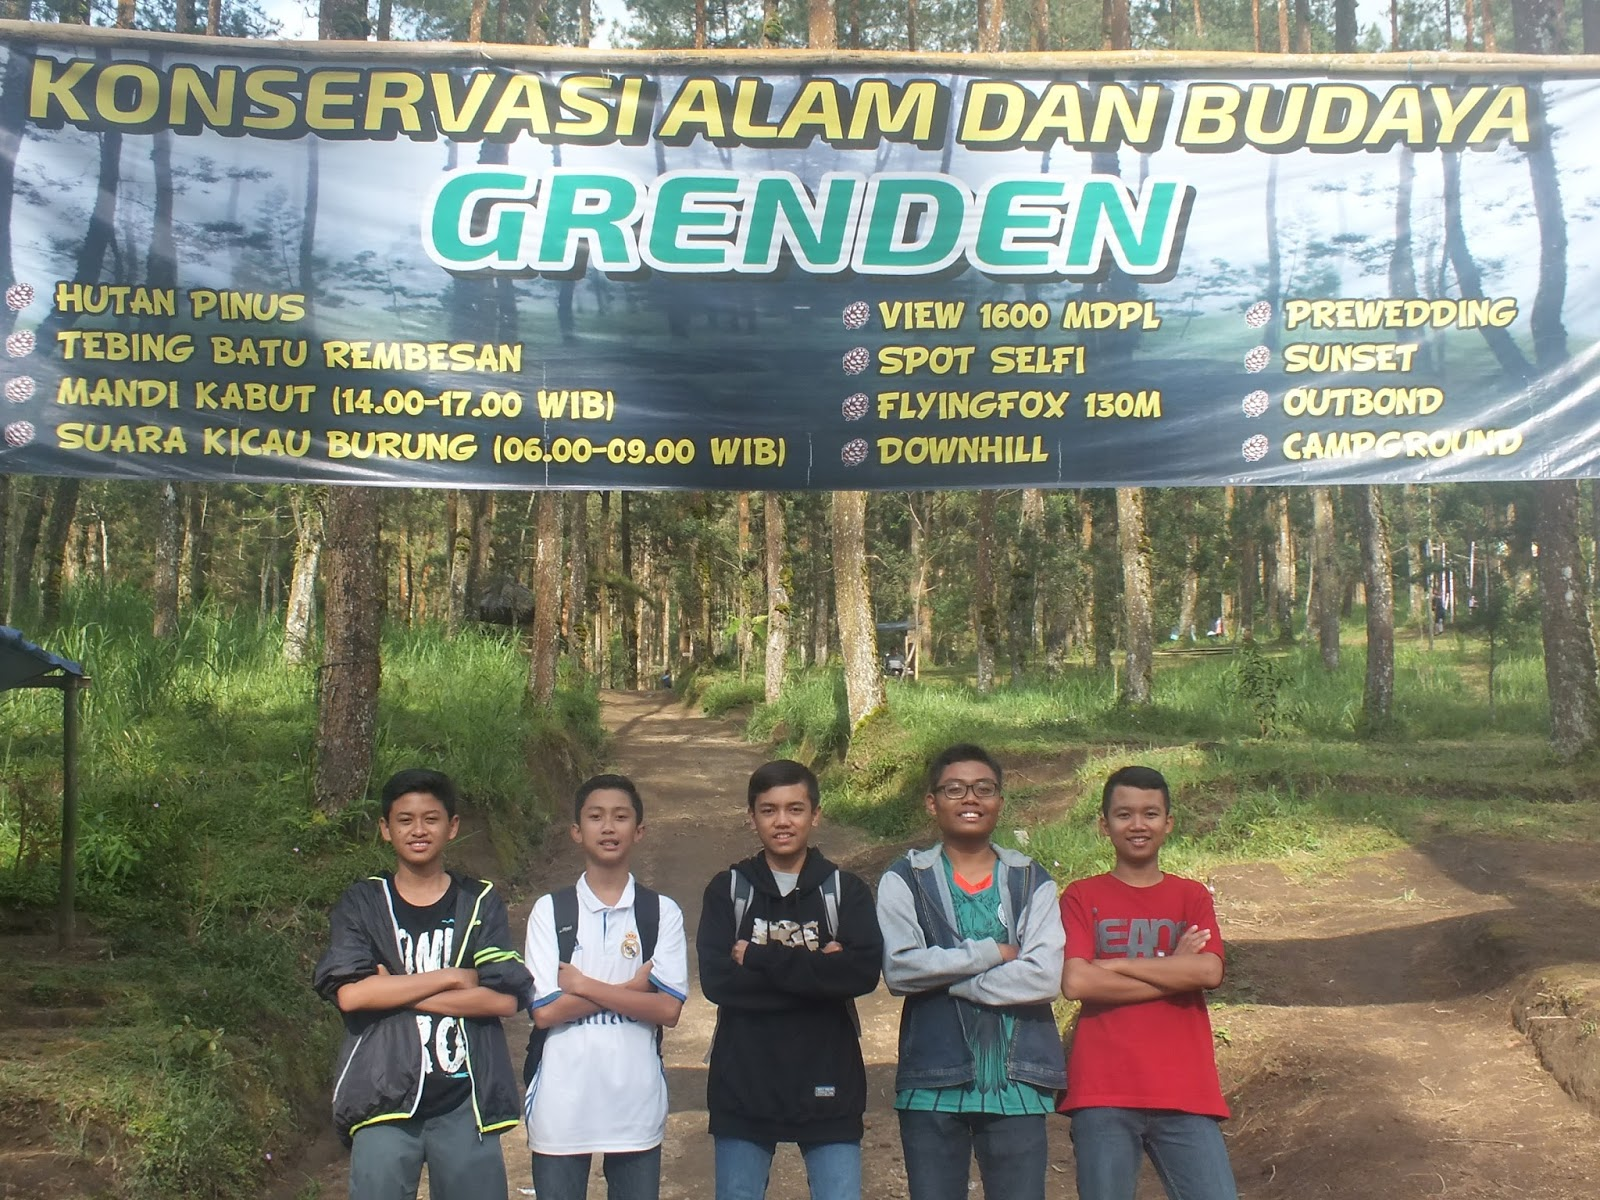 Explore Magelang Keindahan Hutan Pinus Grenden Kab